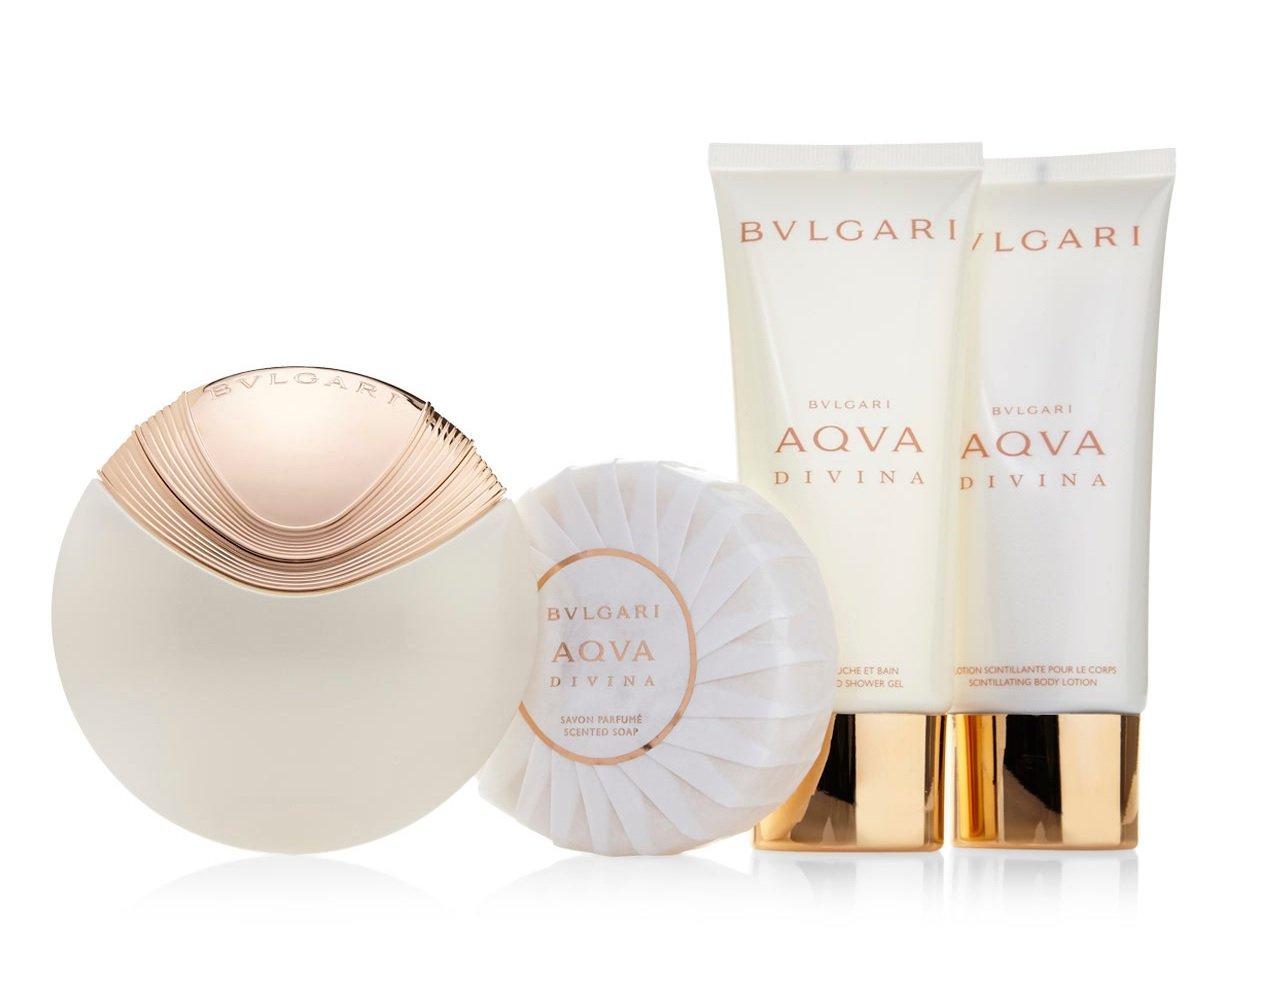 Bulgari Aqua Divina Set contains Eau de Toilette Spray 65 ml/Soap 150 g/Shower Gel 100 ml and Body Lotion 100 ml NLA133728 0783320806377 sku